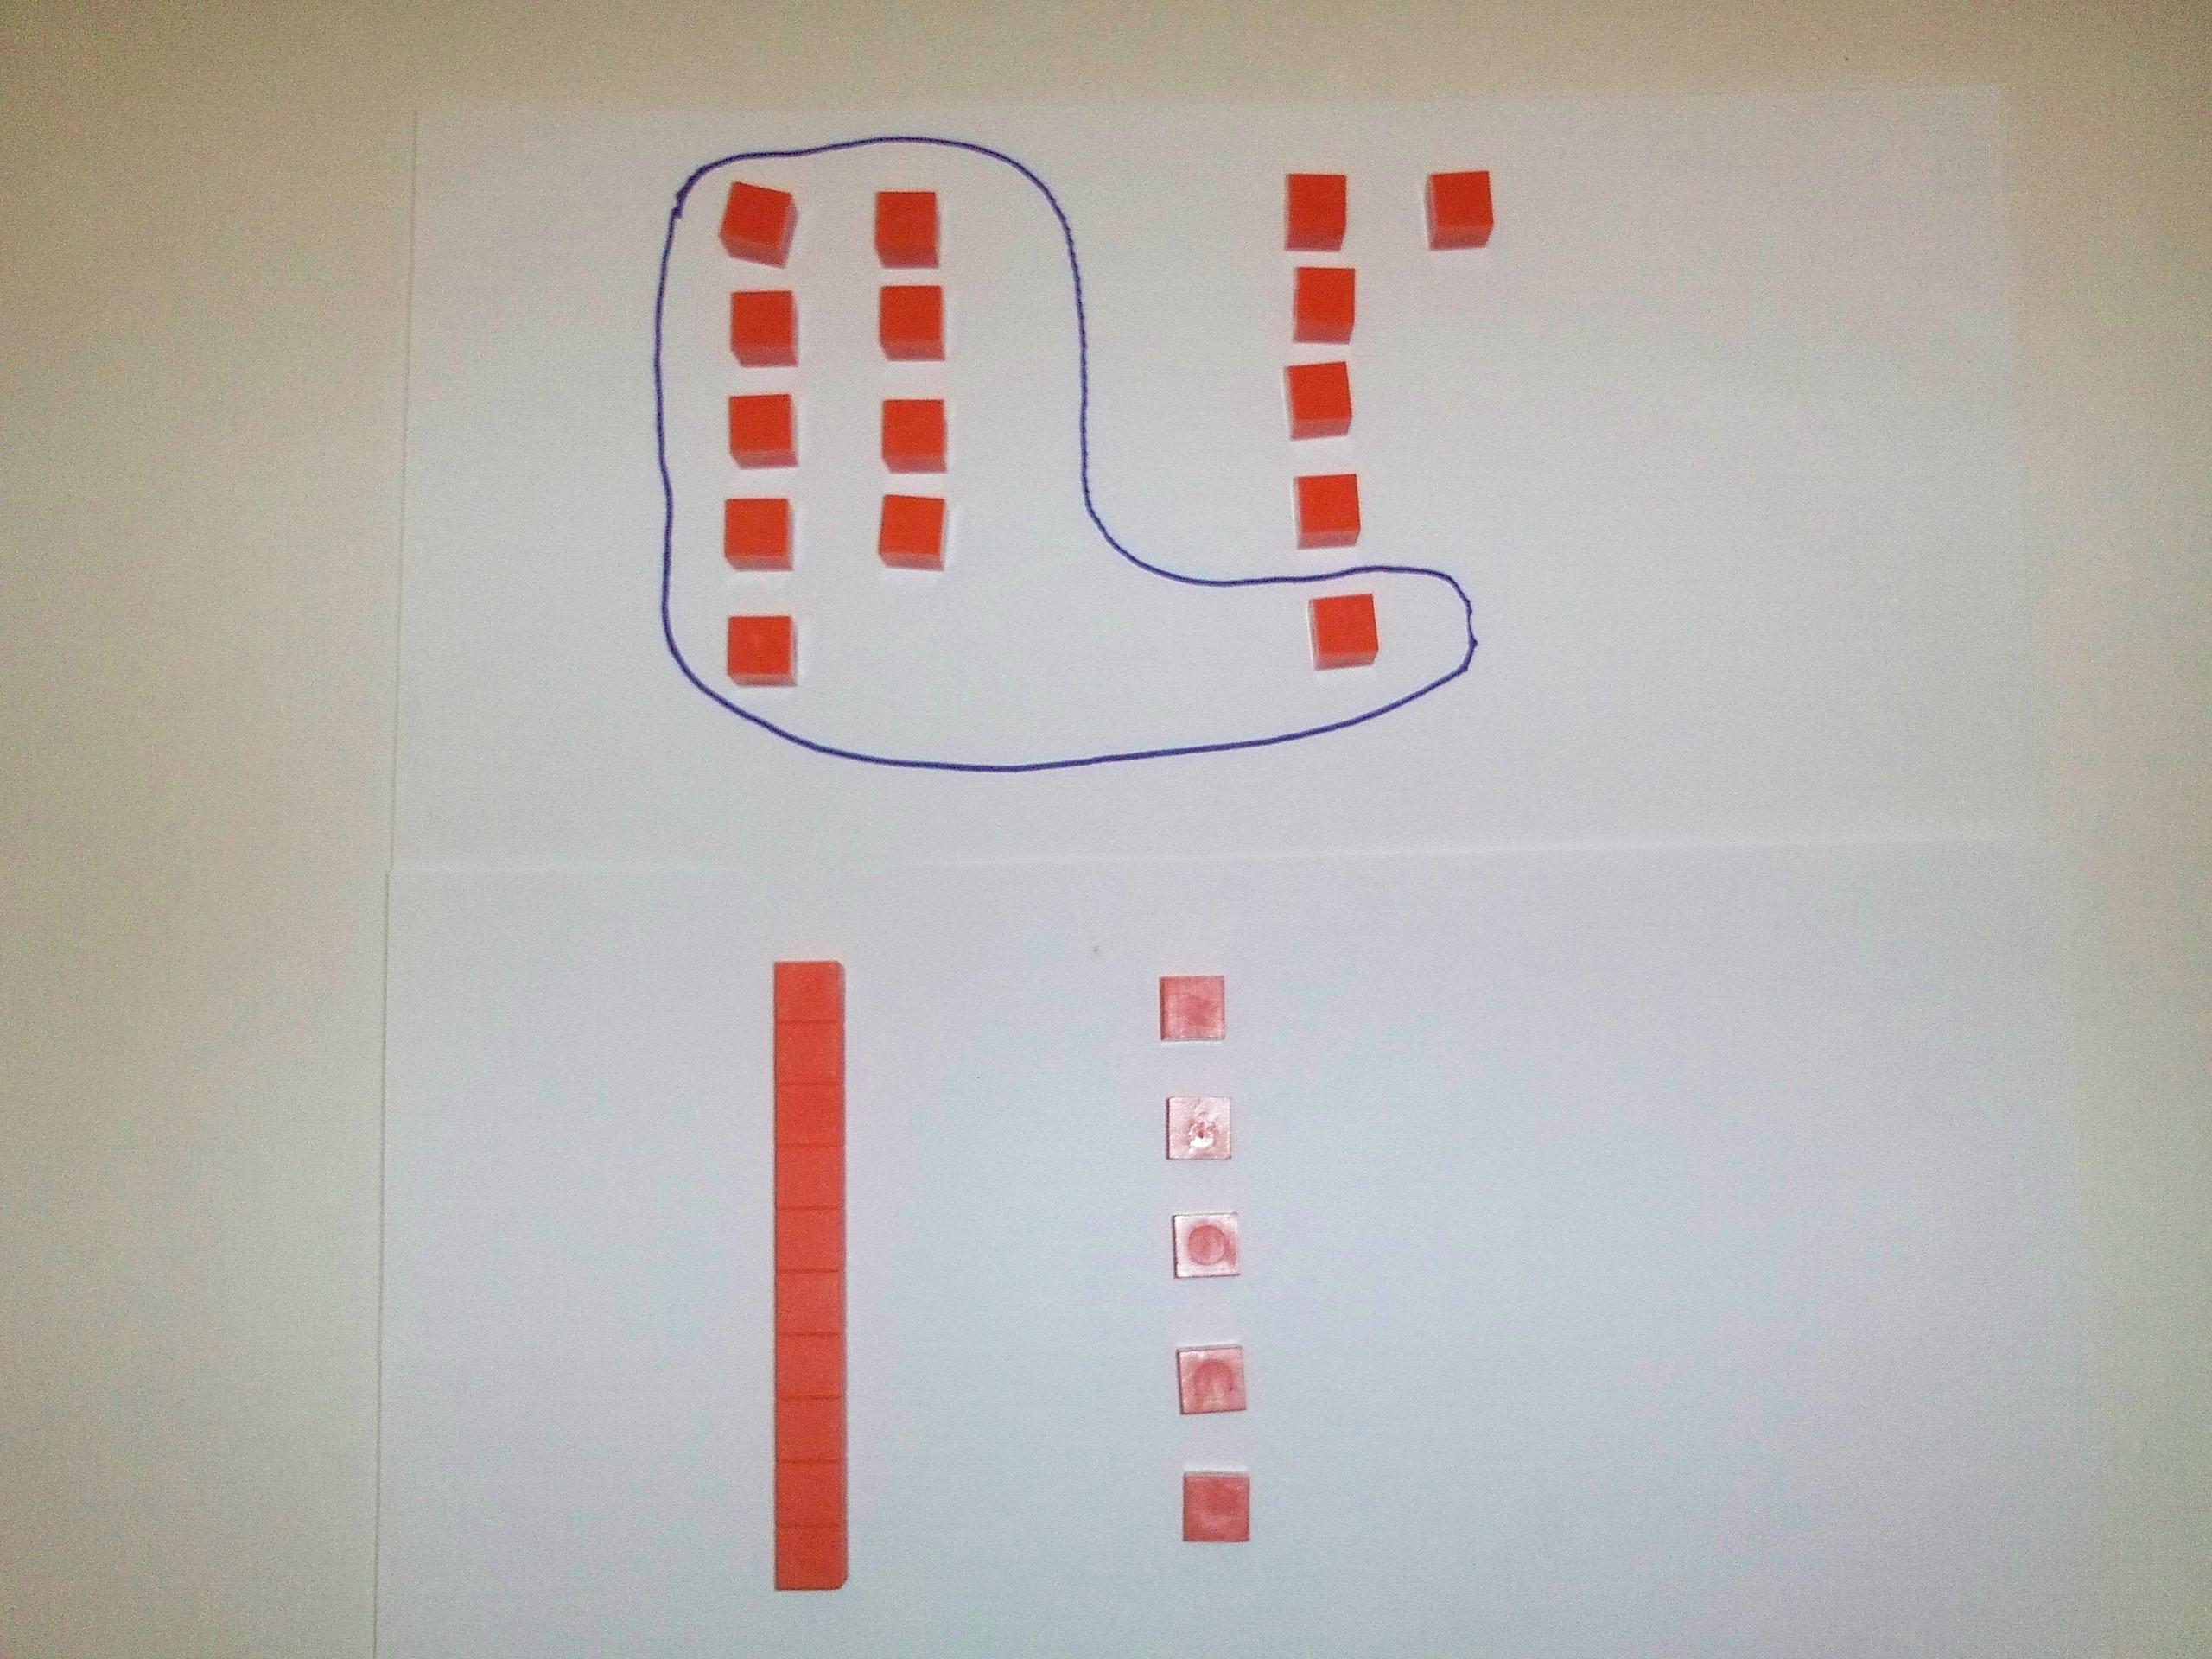 Base Ten Numeration